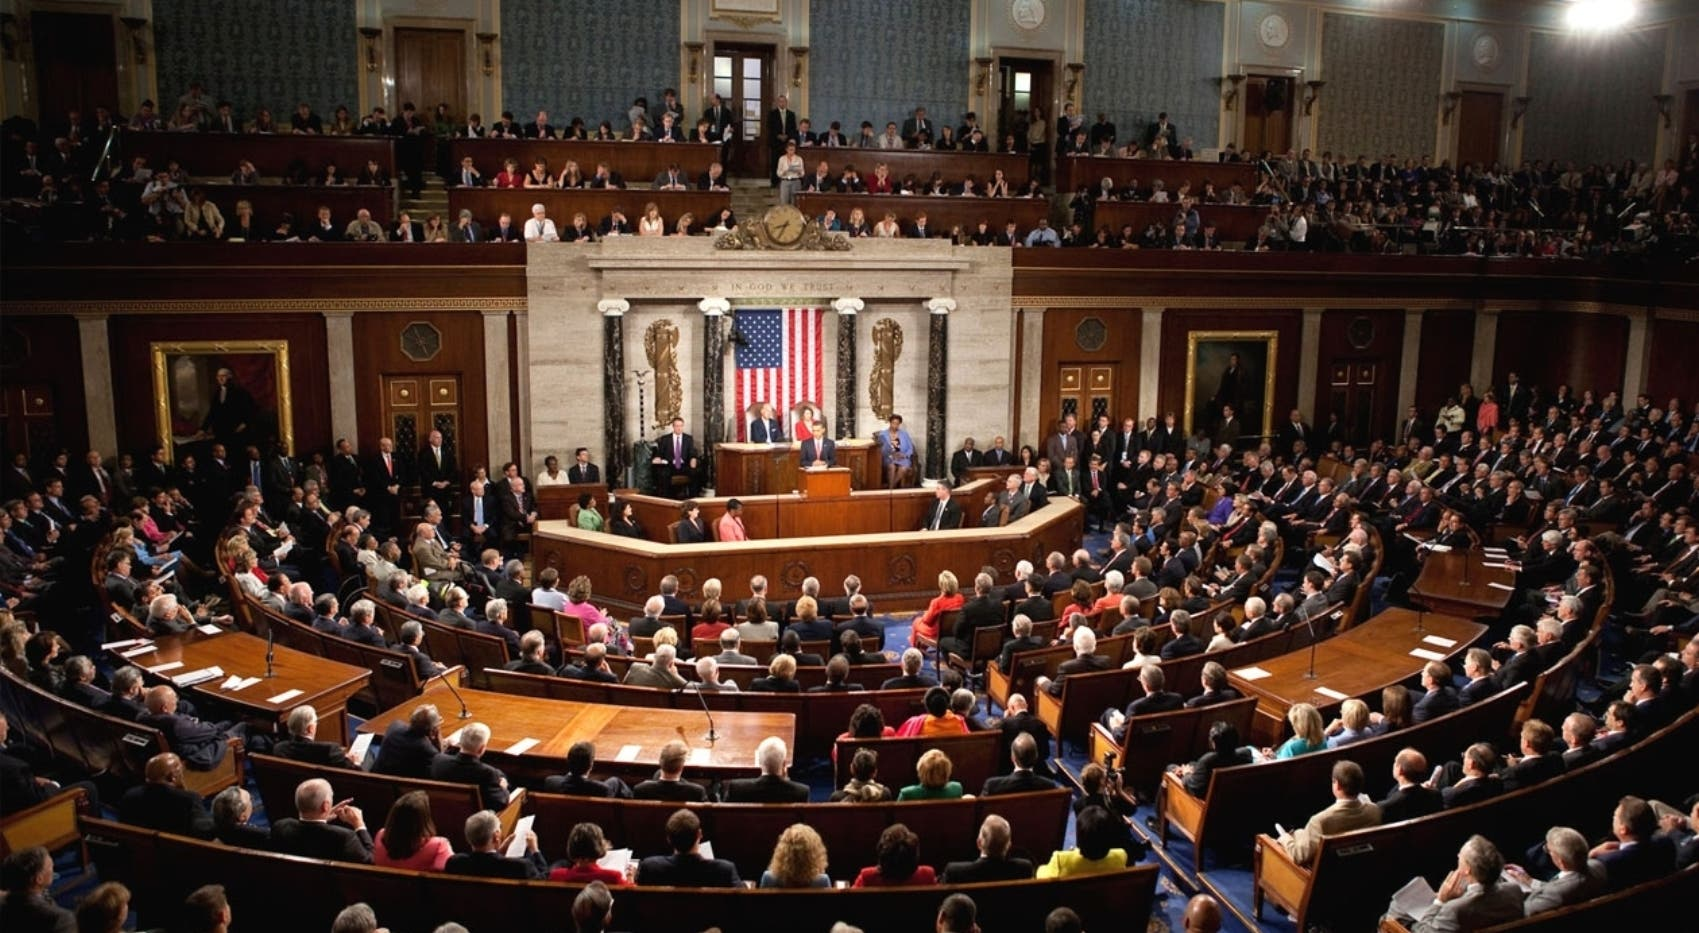 Demócratas buscan votos para llevar testigos claves a juicio contra Trump